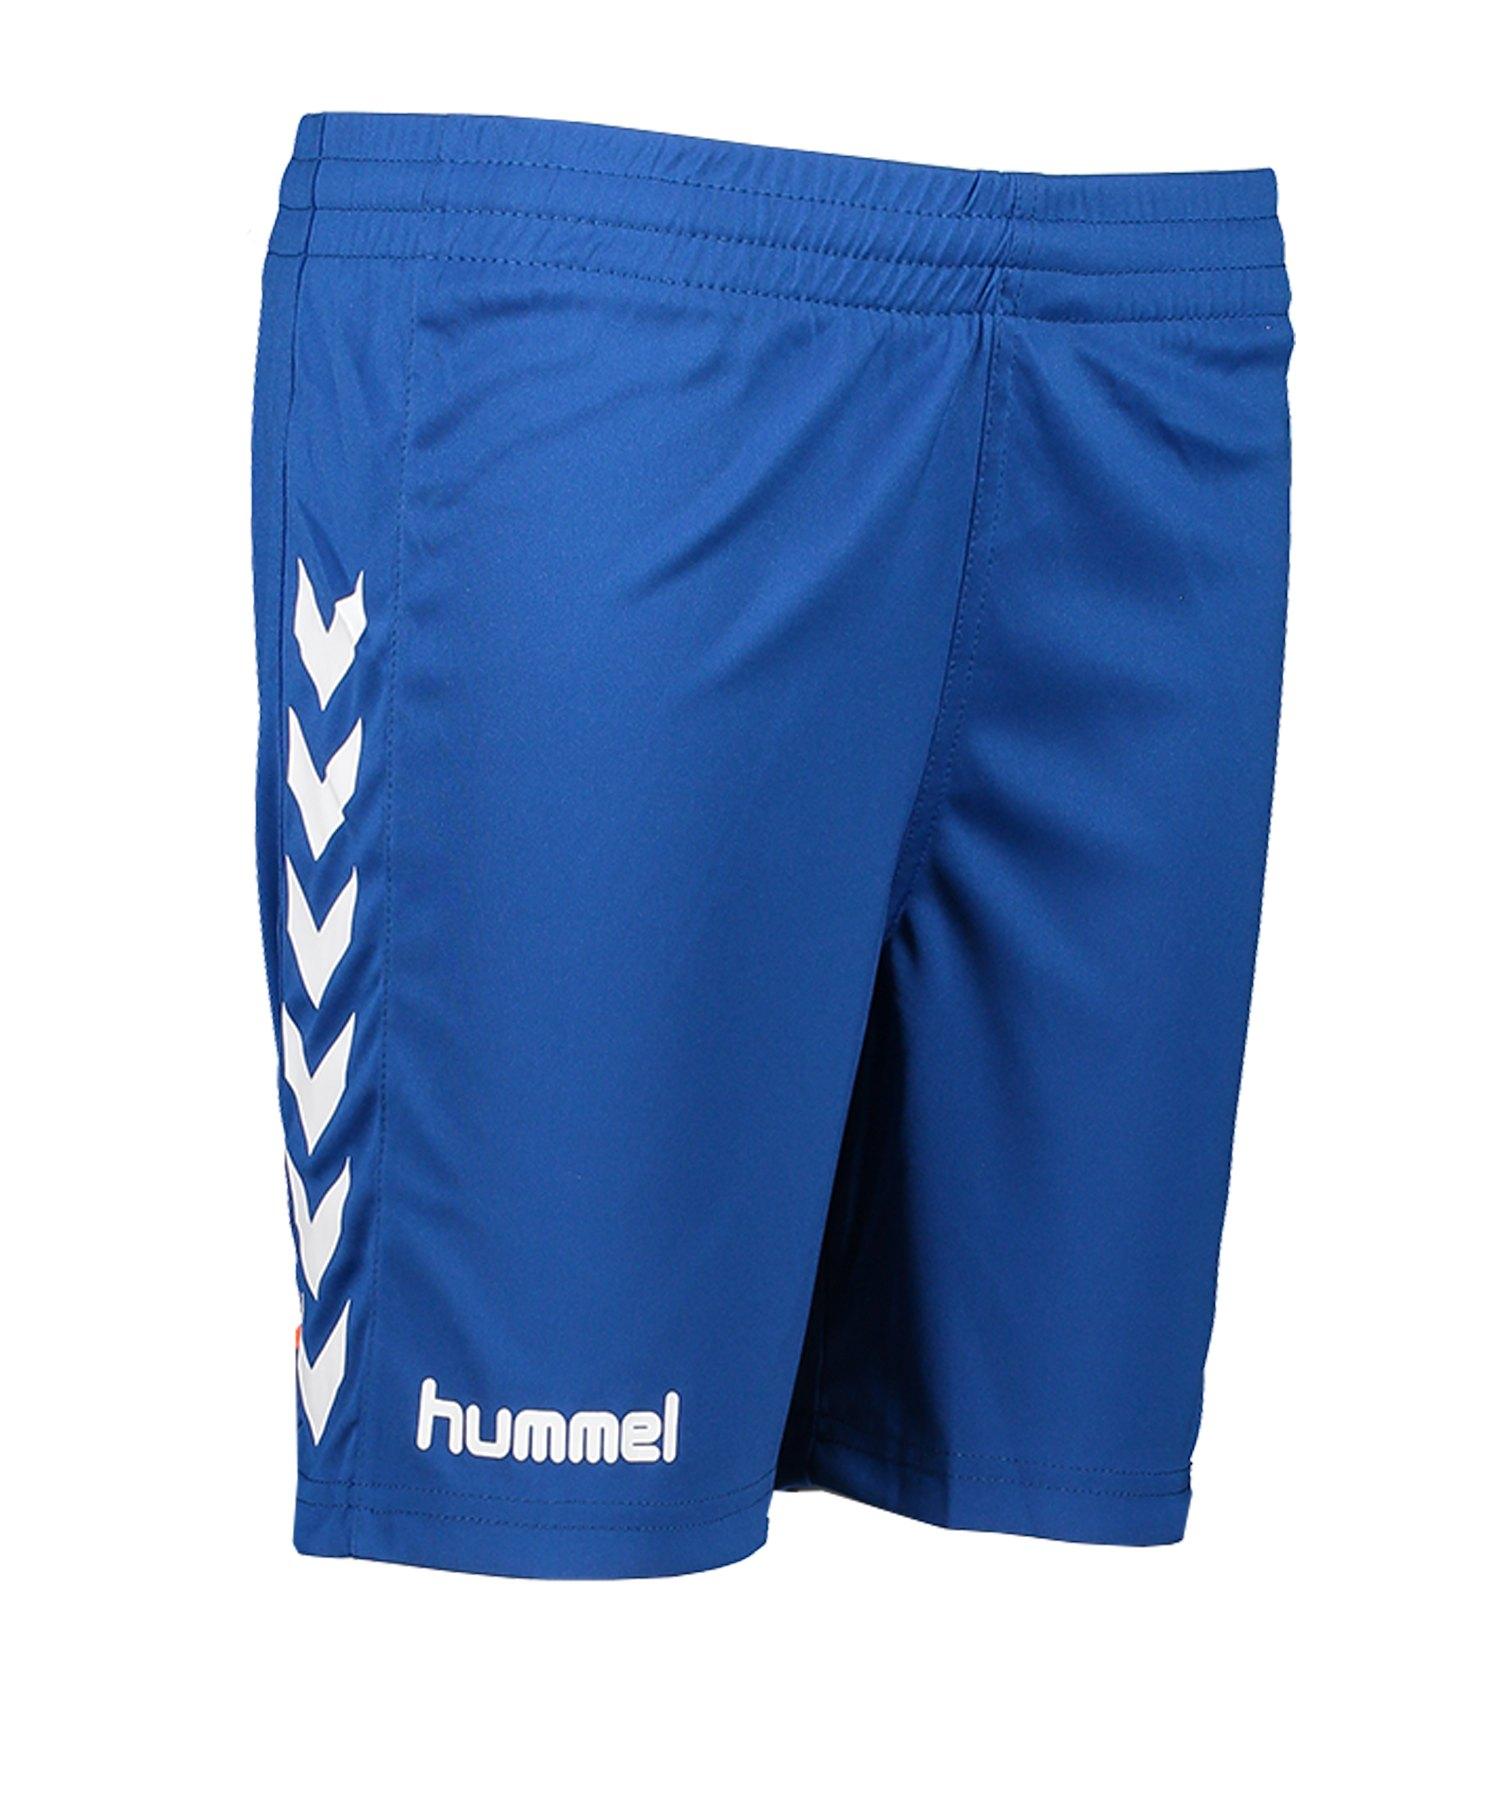 Hummel Core Short Kids Blau F7043 - blau